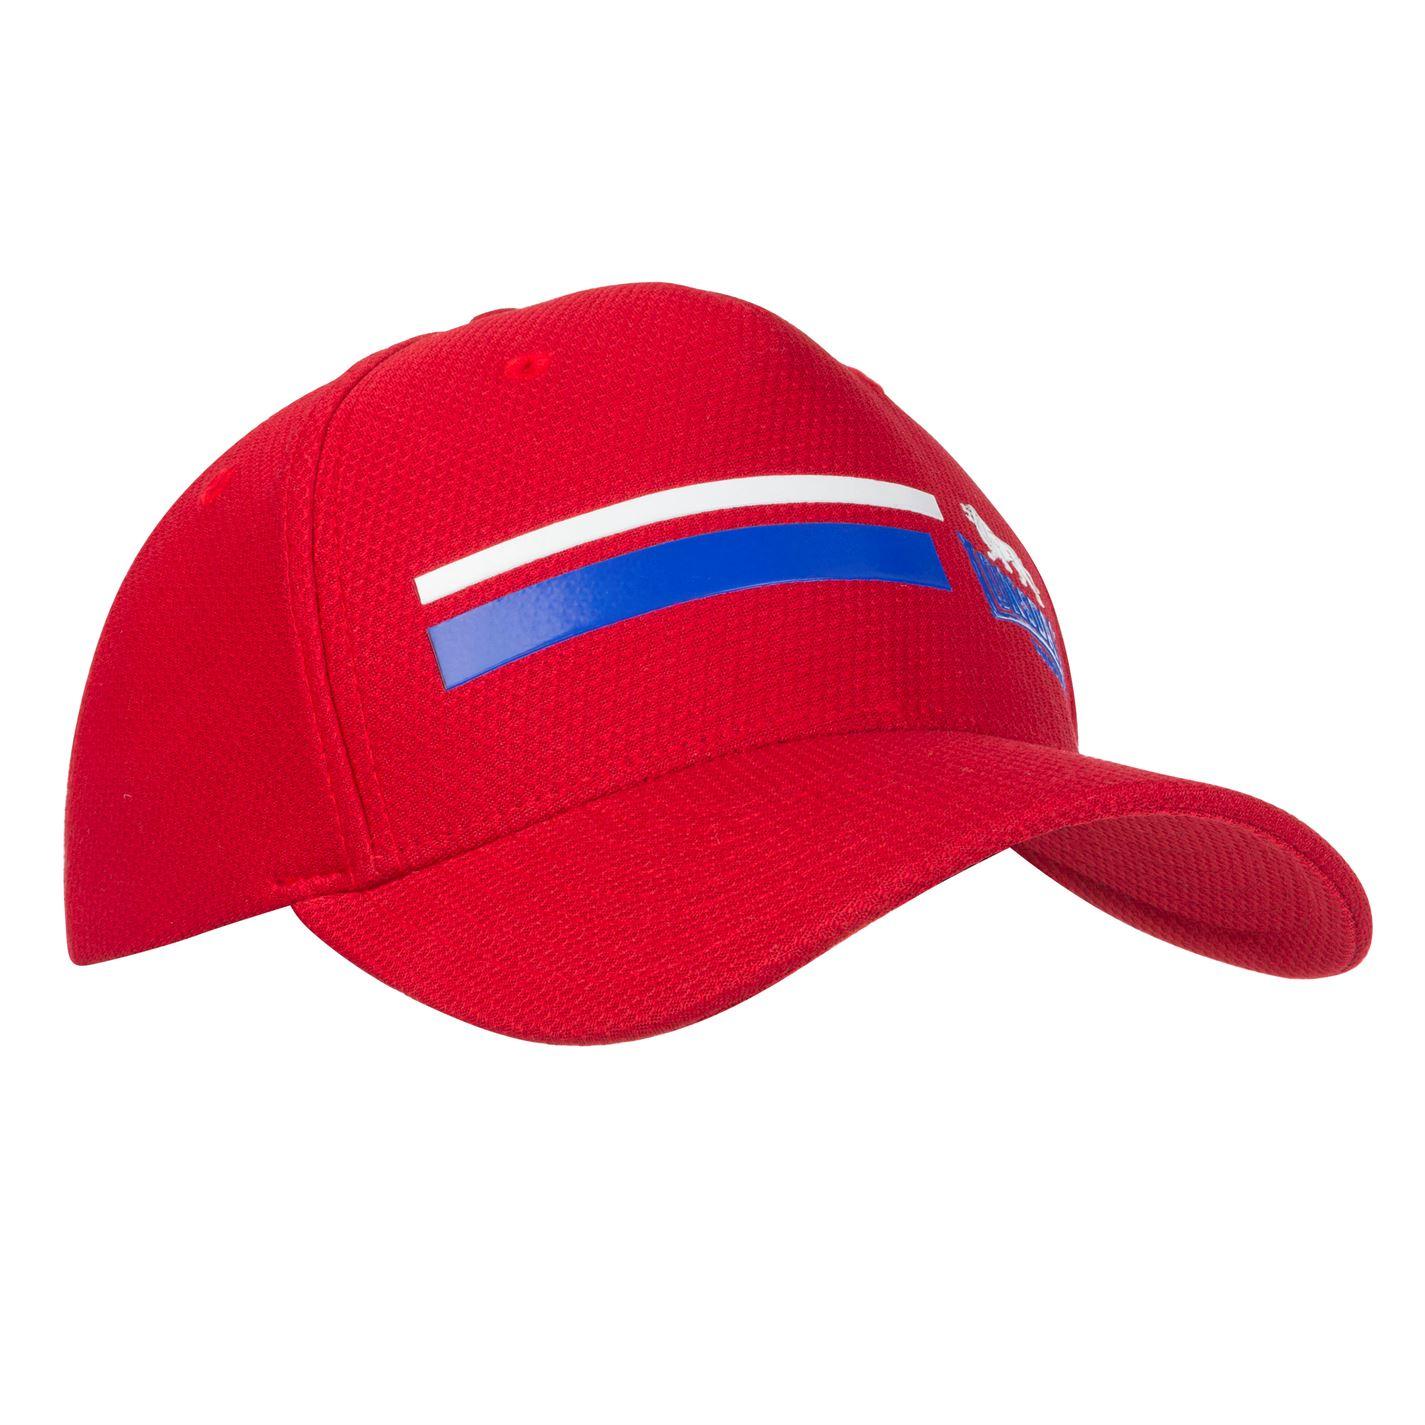 Lonsdale Mens Mesh Baseball Cap Hat Headwear Accessories